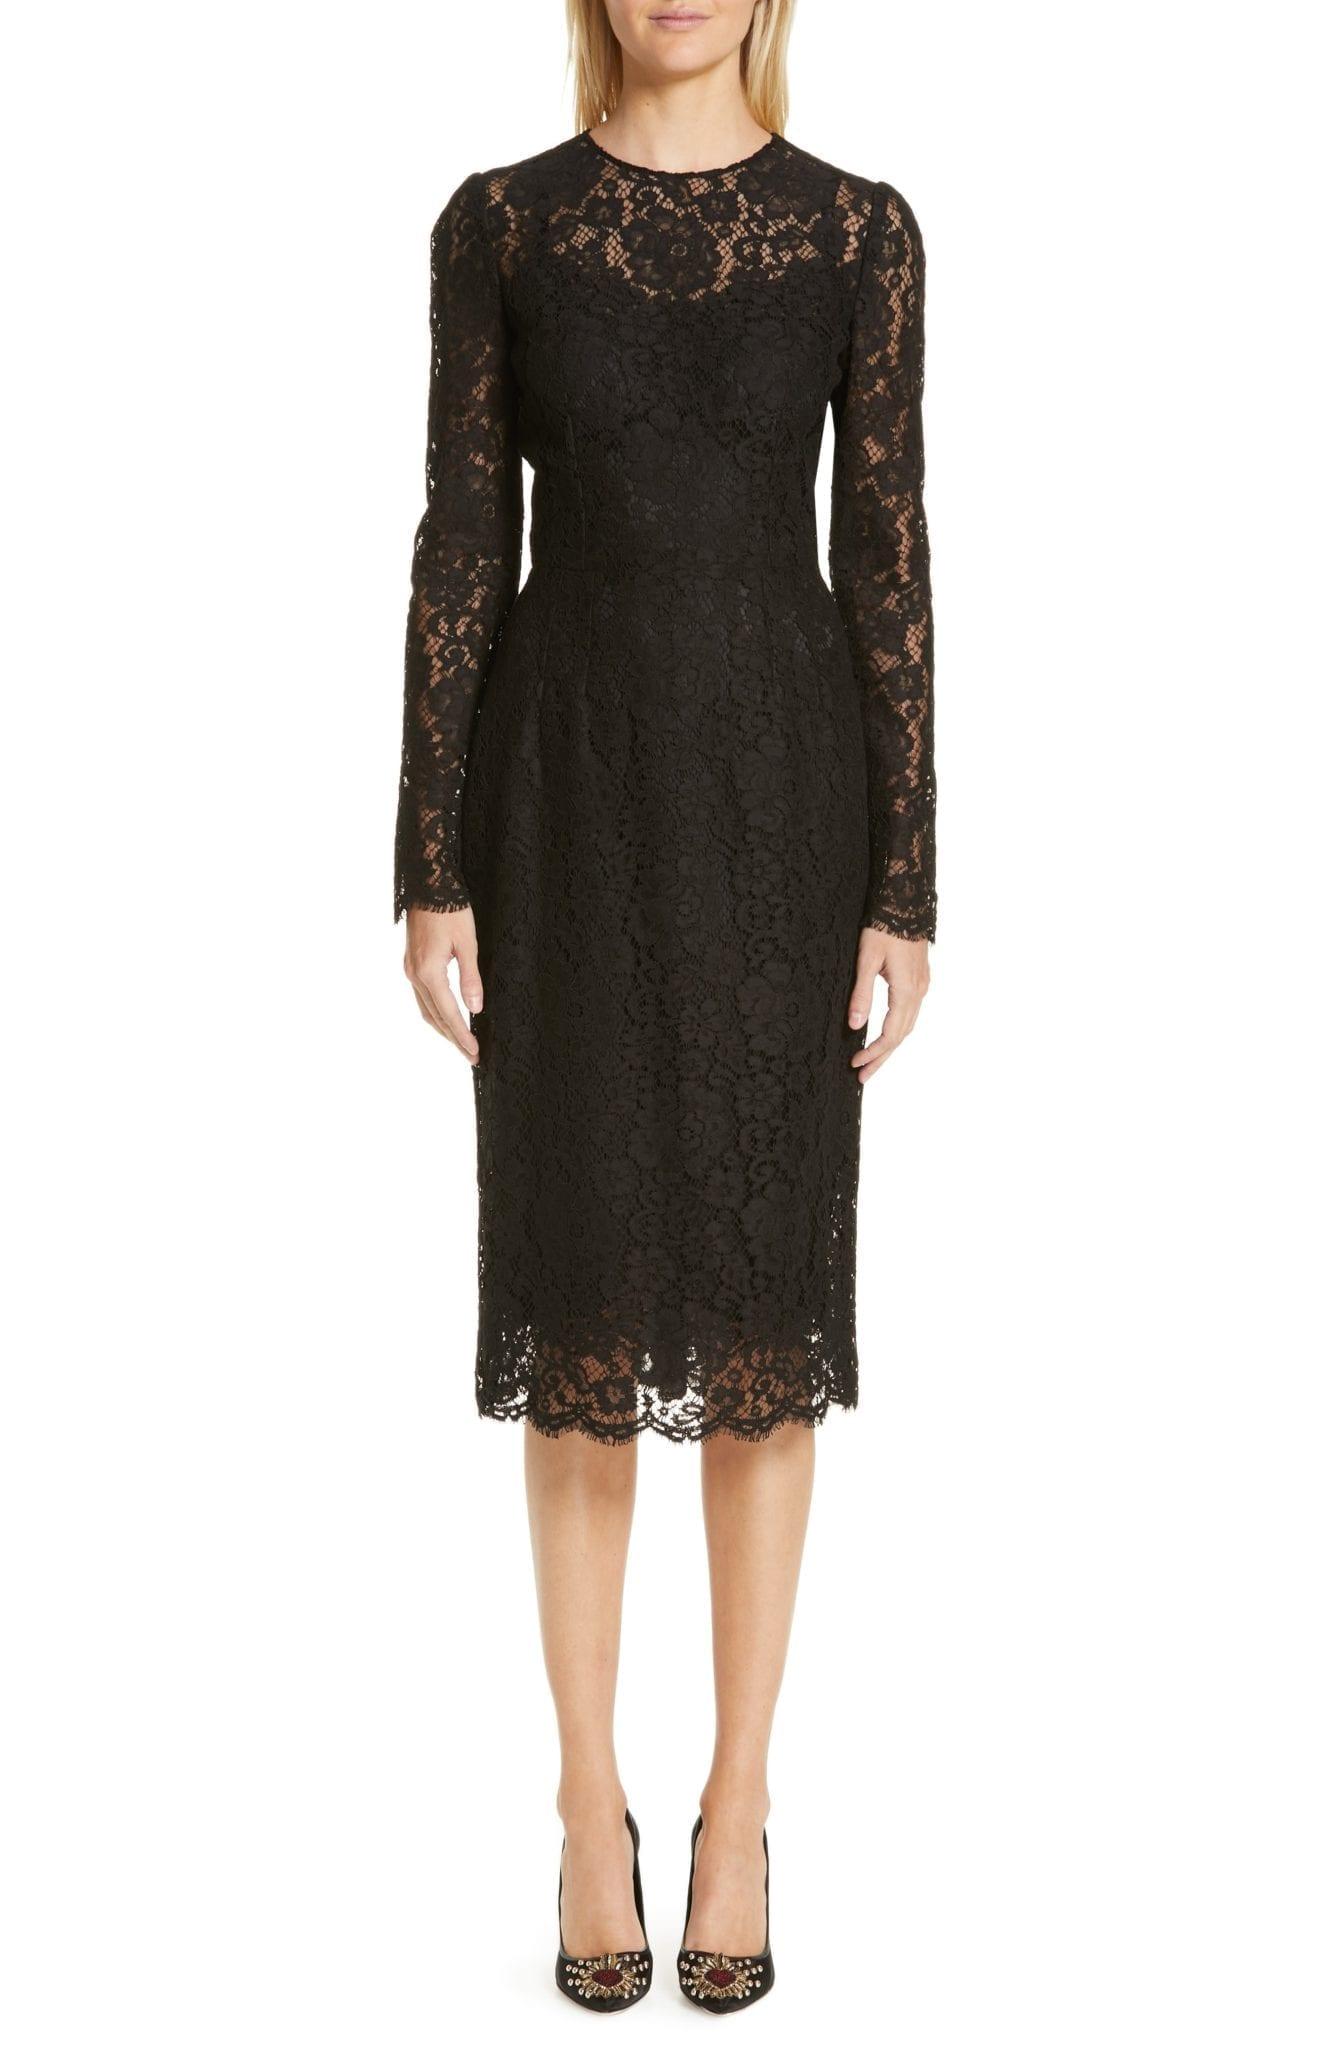 DOLCE&GABBANA Lace Pencil Black Dress